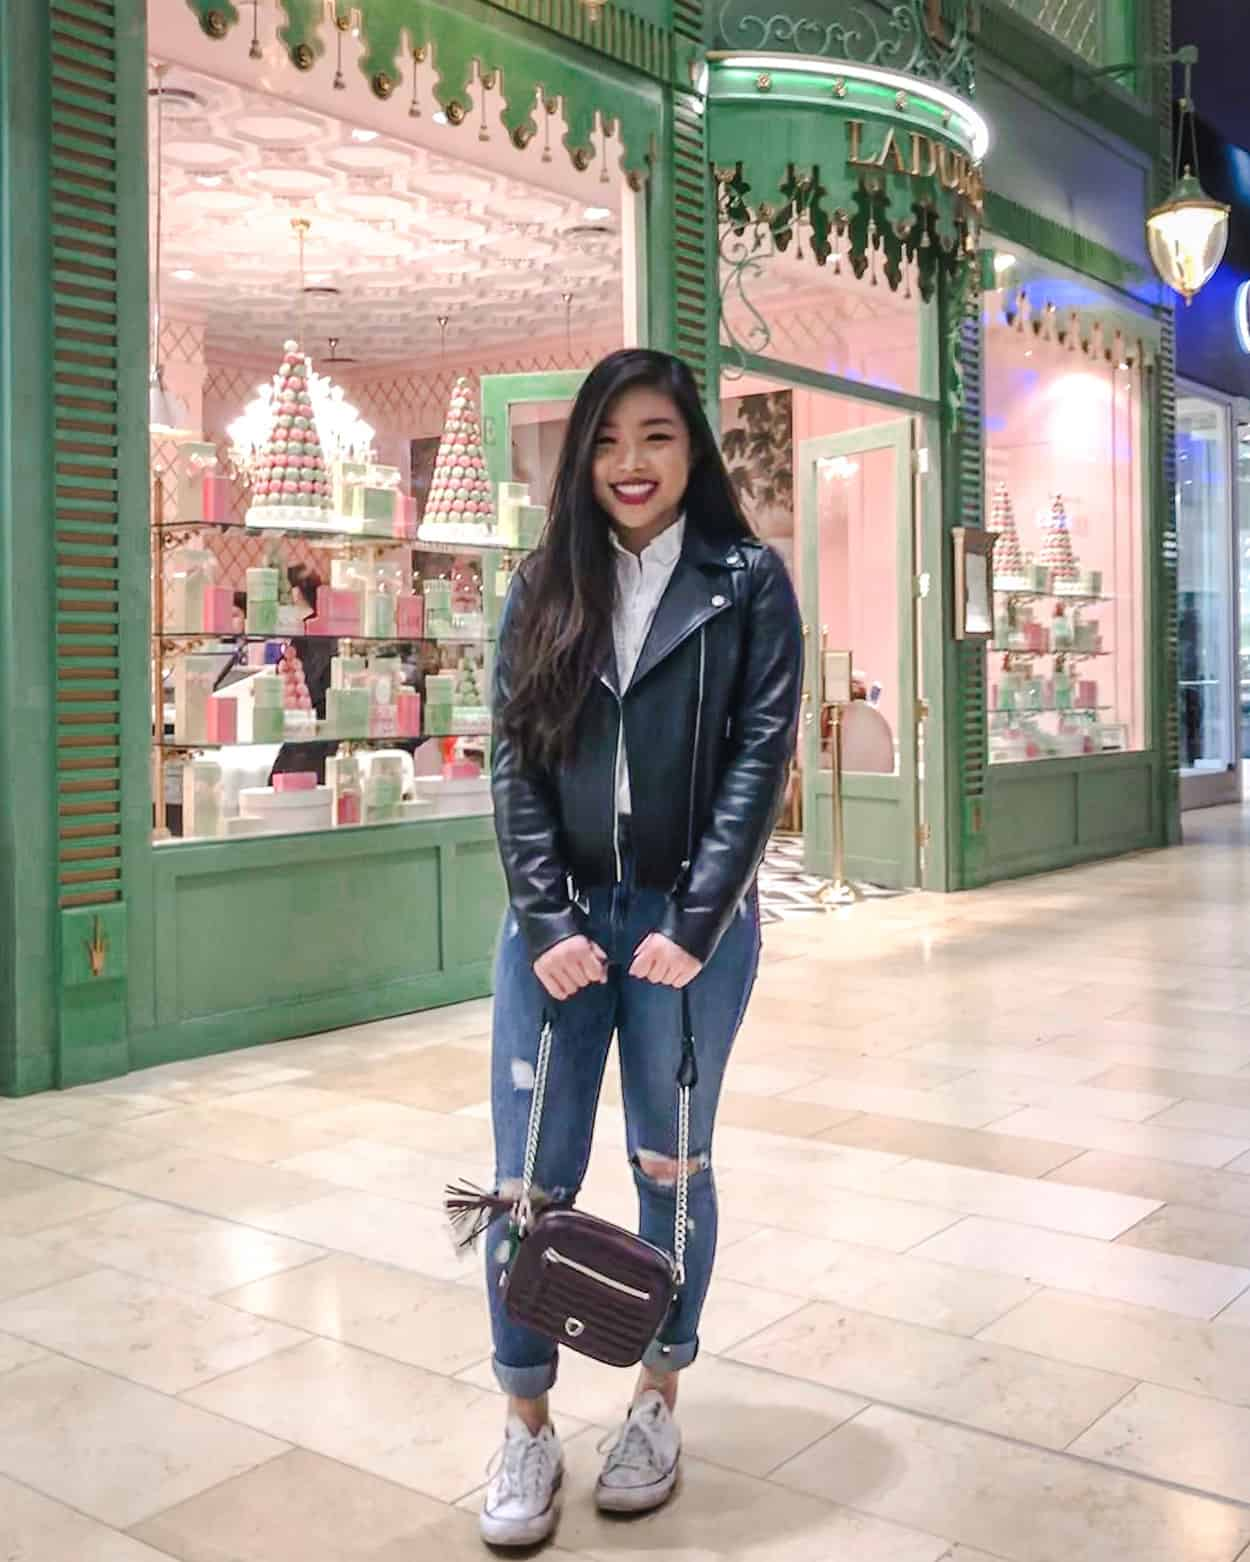 Ladurée Yorkdale Mall